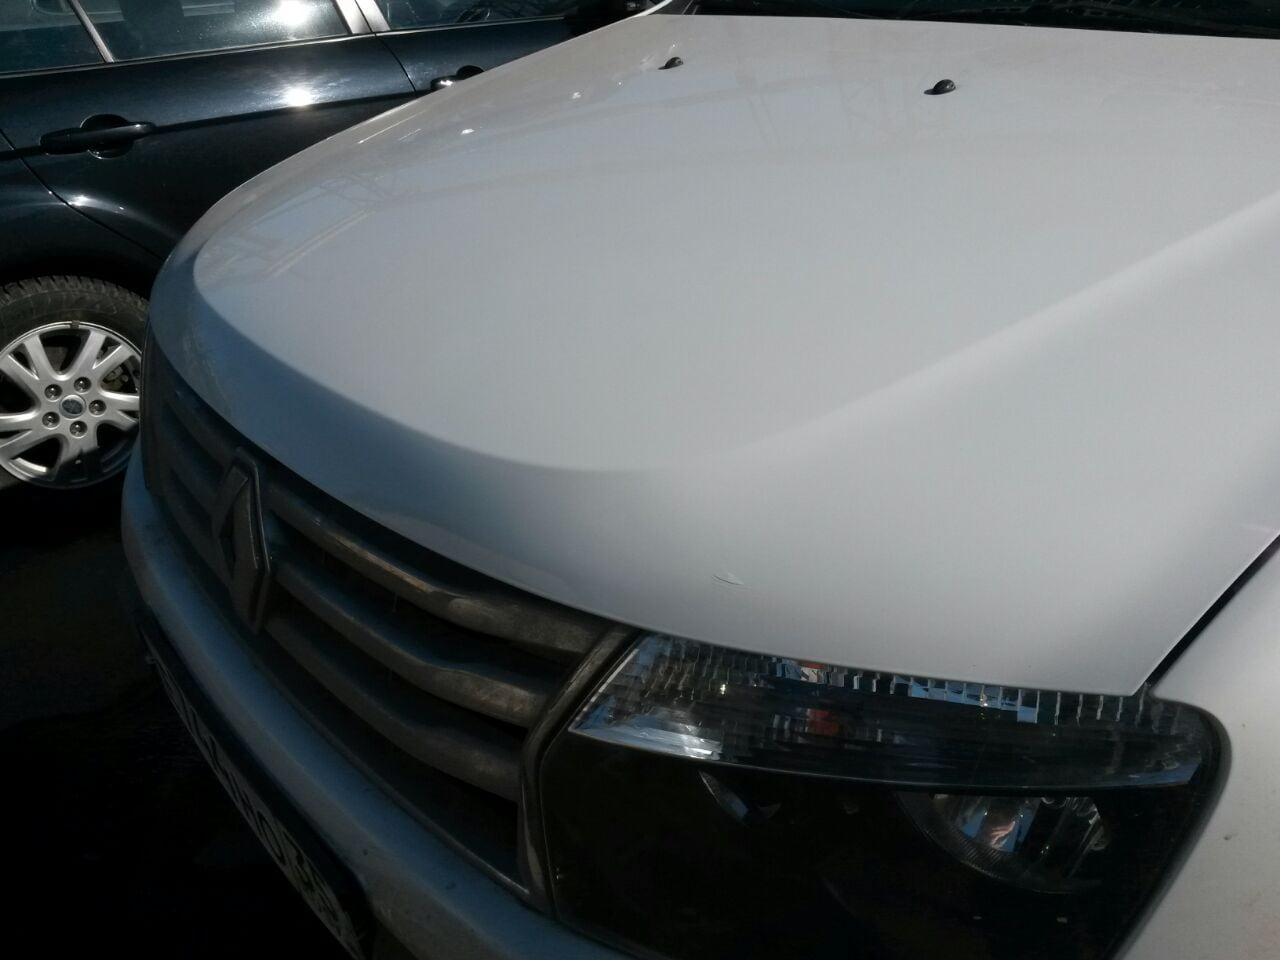 Фото авто после ремонта